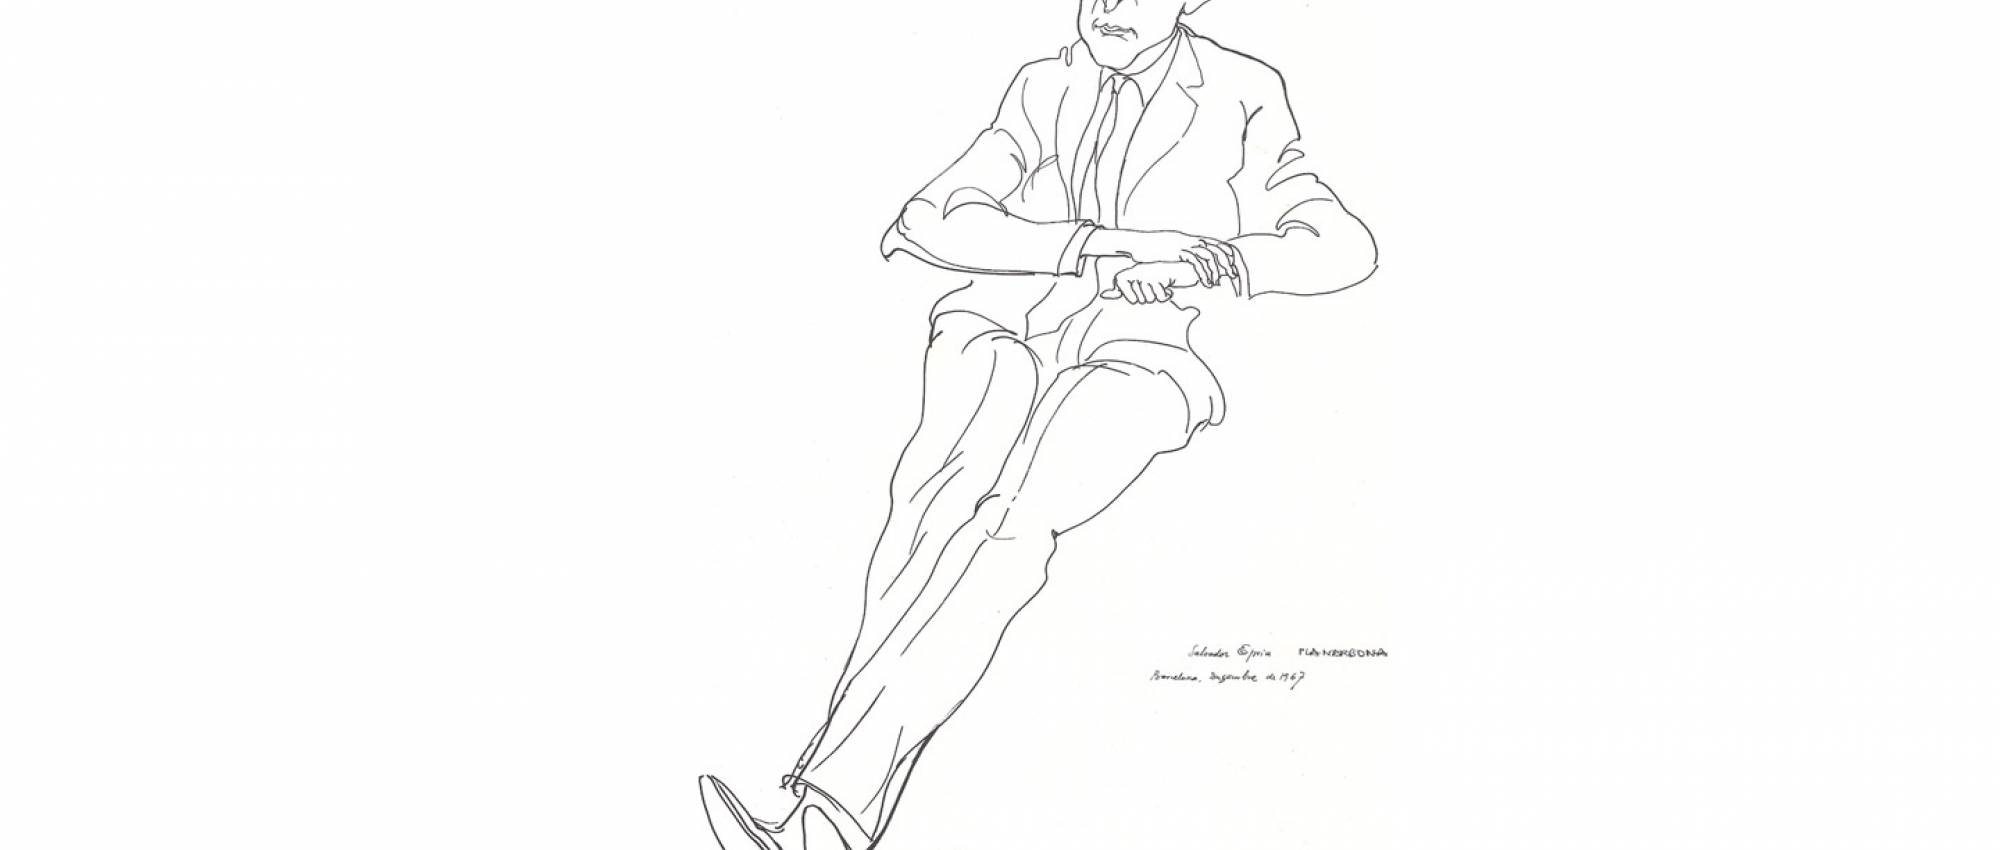 Retrat de Salvador Espriu per Josep Pla-Narbona. CC BY-SA 3.0 - Josep Pla-Narbona / Wikimedia Commons